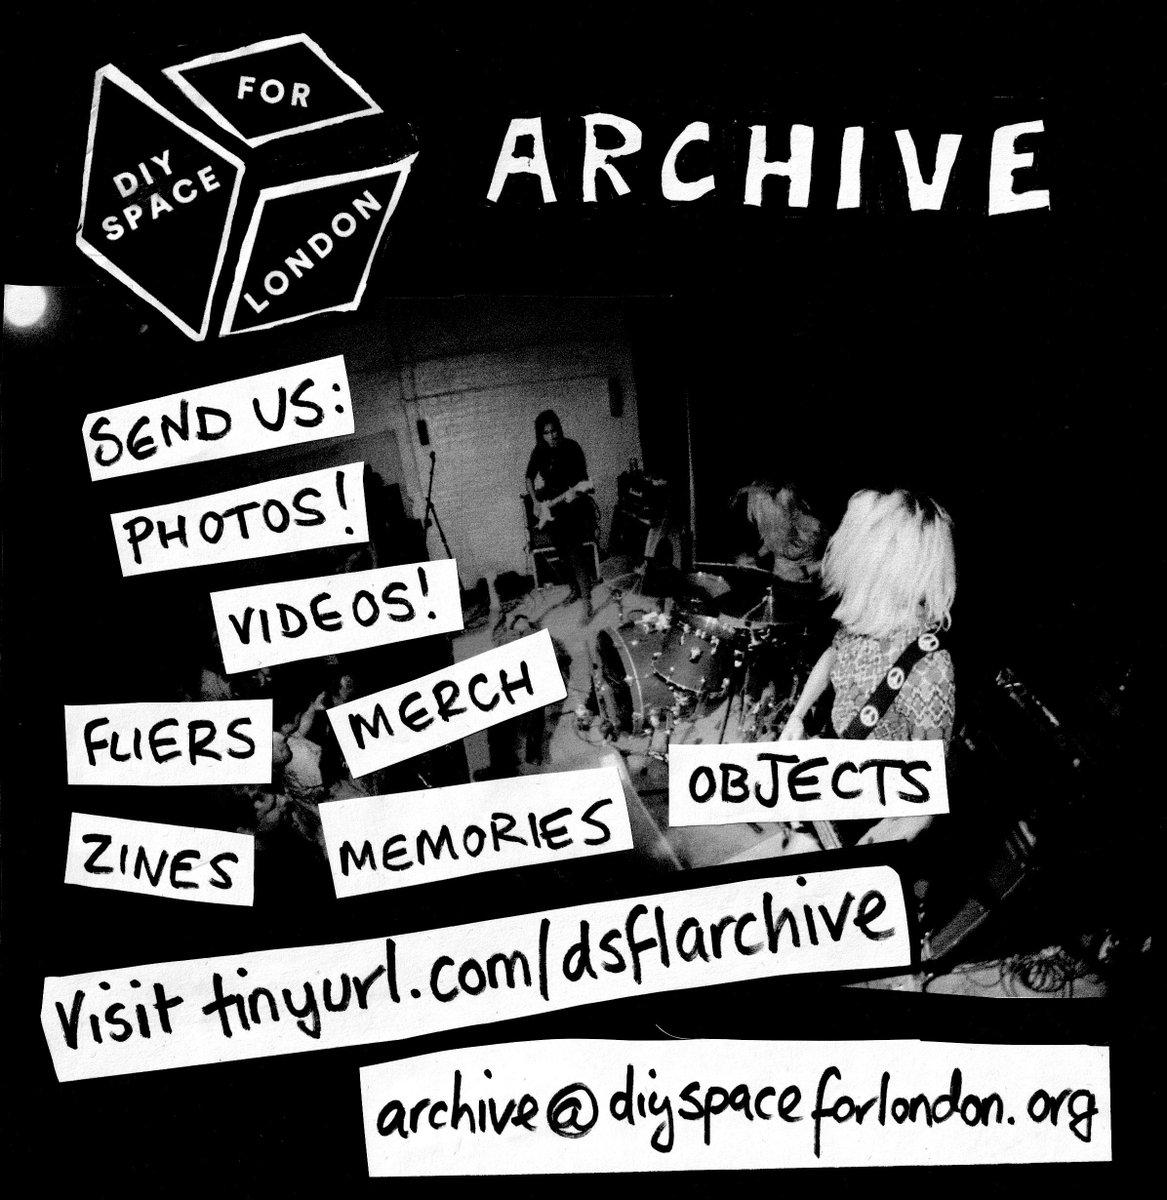 *DIY SPACE FOR LONDON ARCHIVE* please send us your: - photos - videos - flyers - merch - zines - memories - objects visit: tinyurl.com/dsflarchive archive@diyspaceforlondon.org <3